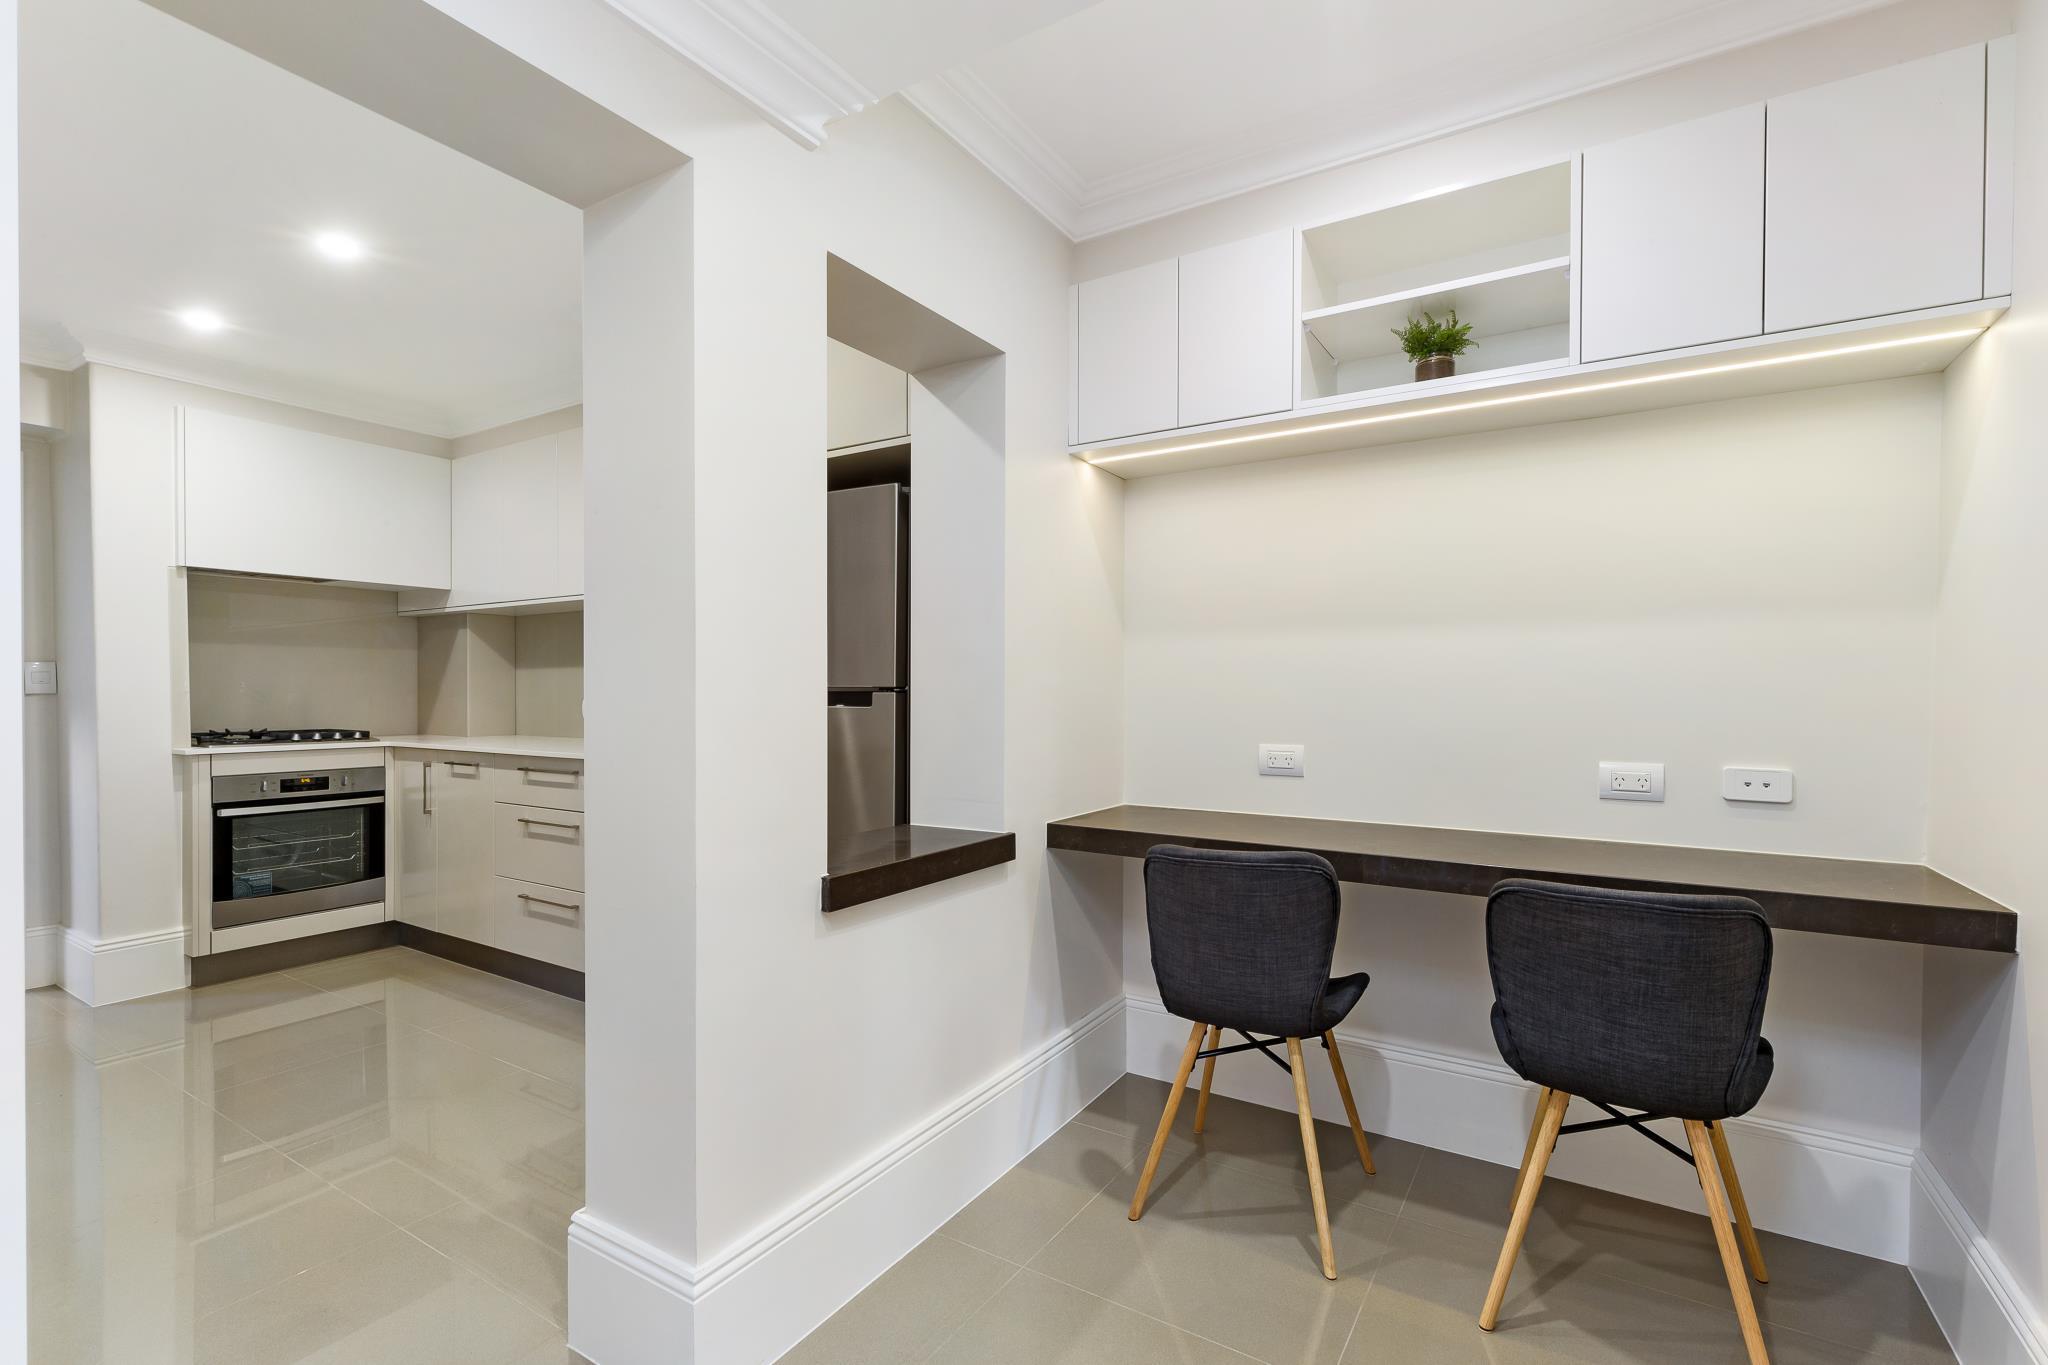 Glebe Furnished Apartments 98 St Johns Road